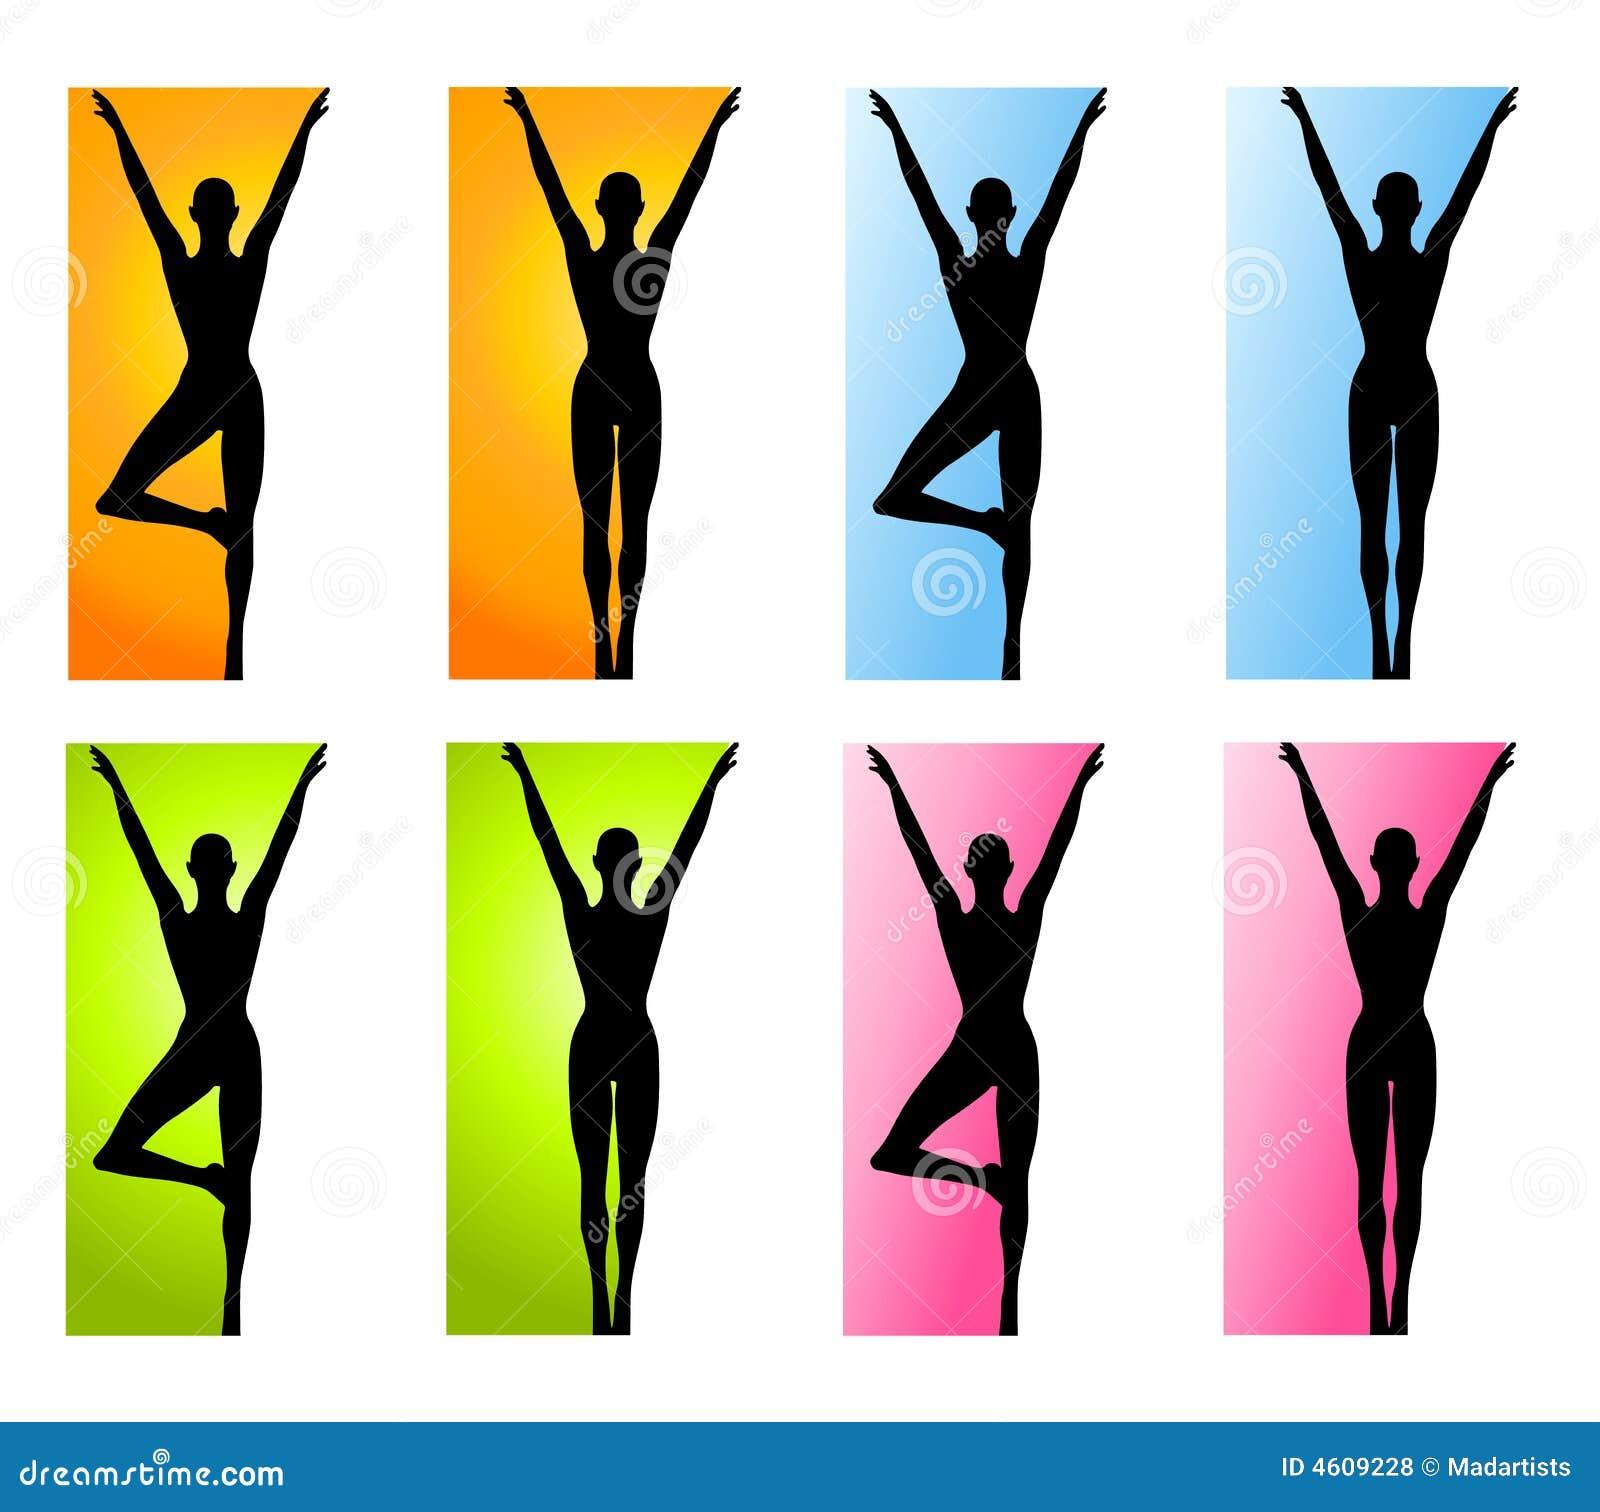 dance exercise clip art - photo #33